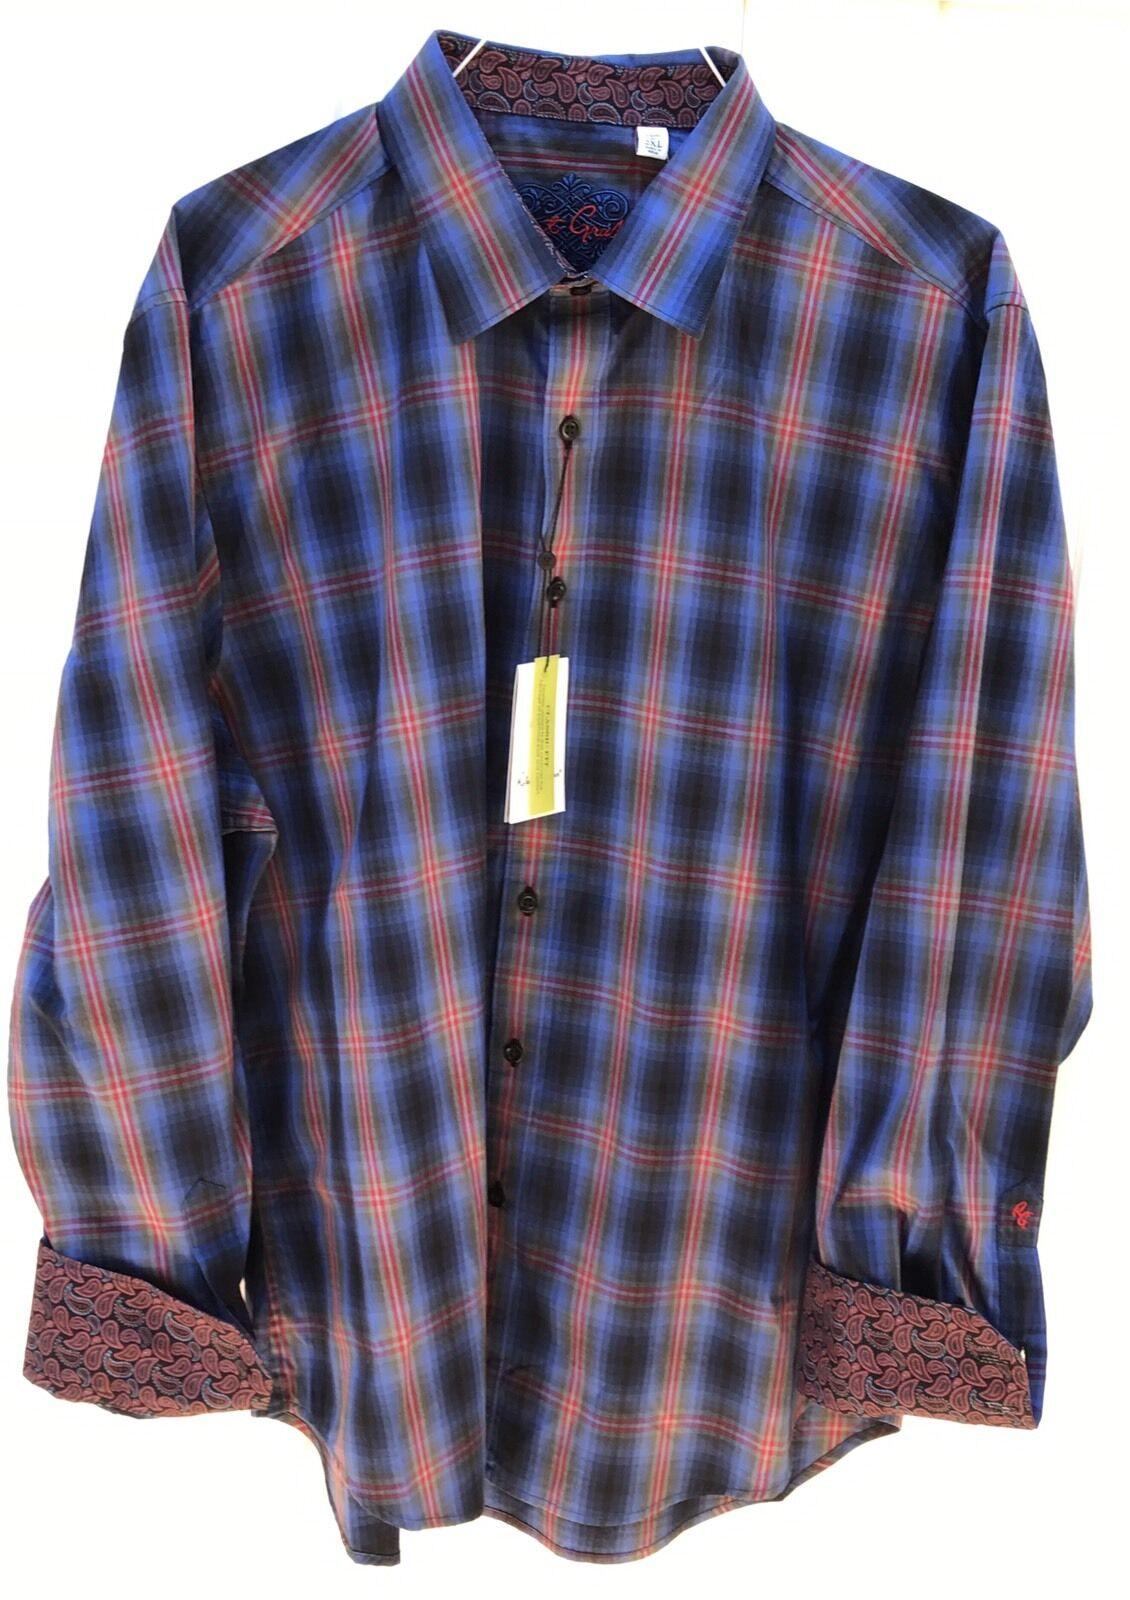 Men's Robert Graham Boomer Multicolor Casual Shirt,Size 2XL.